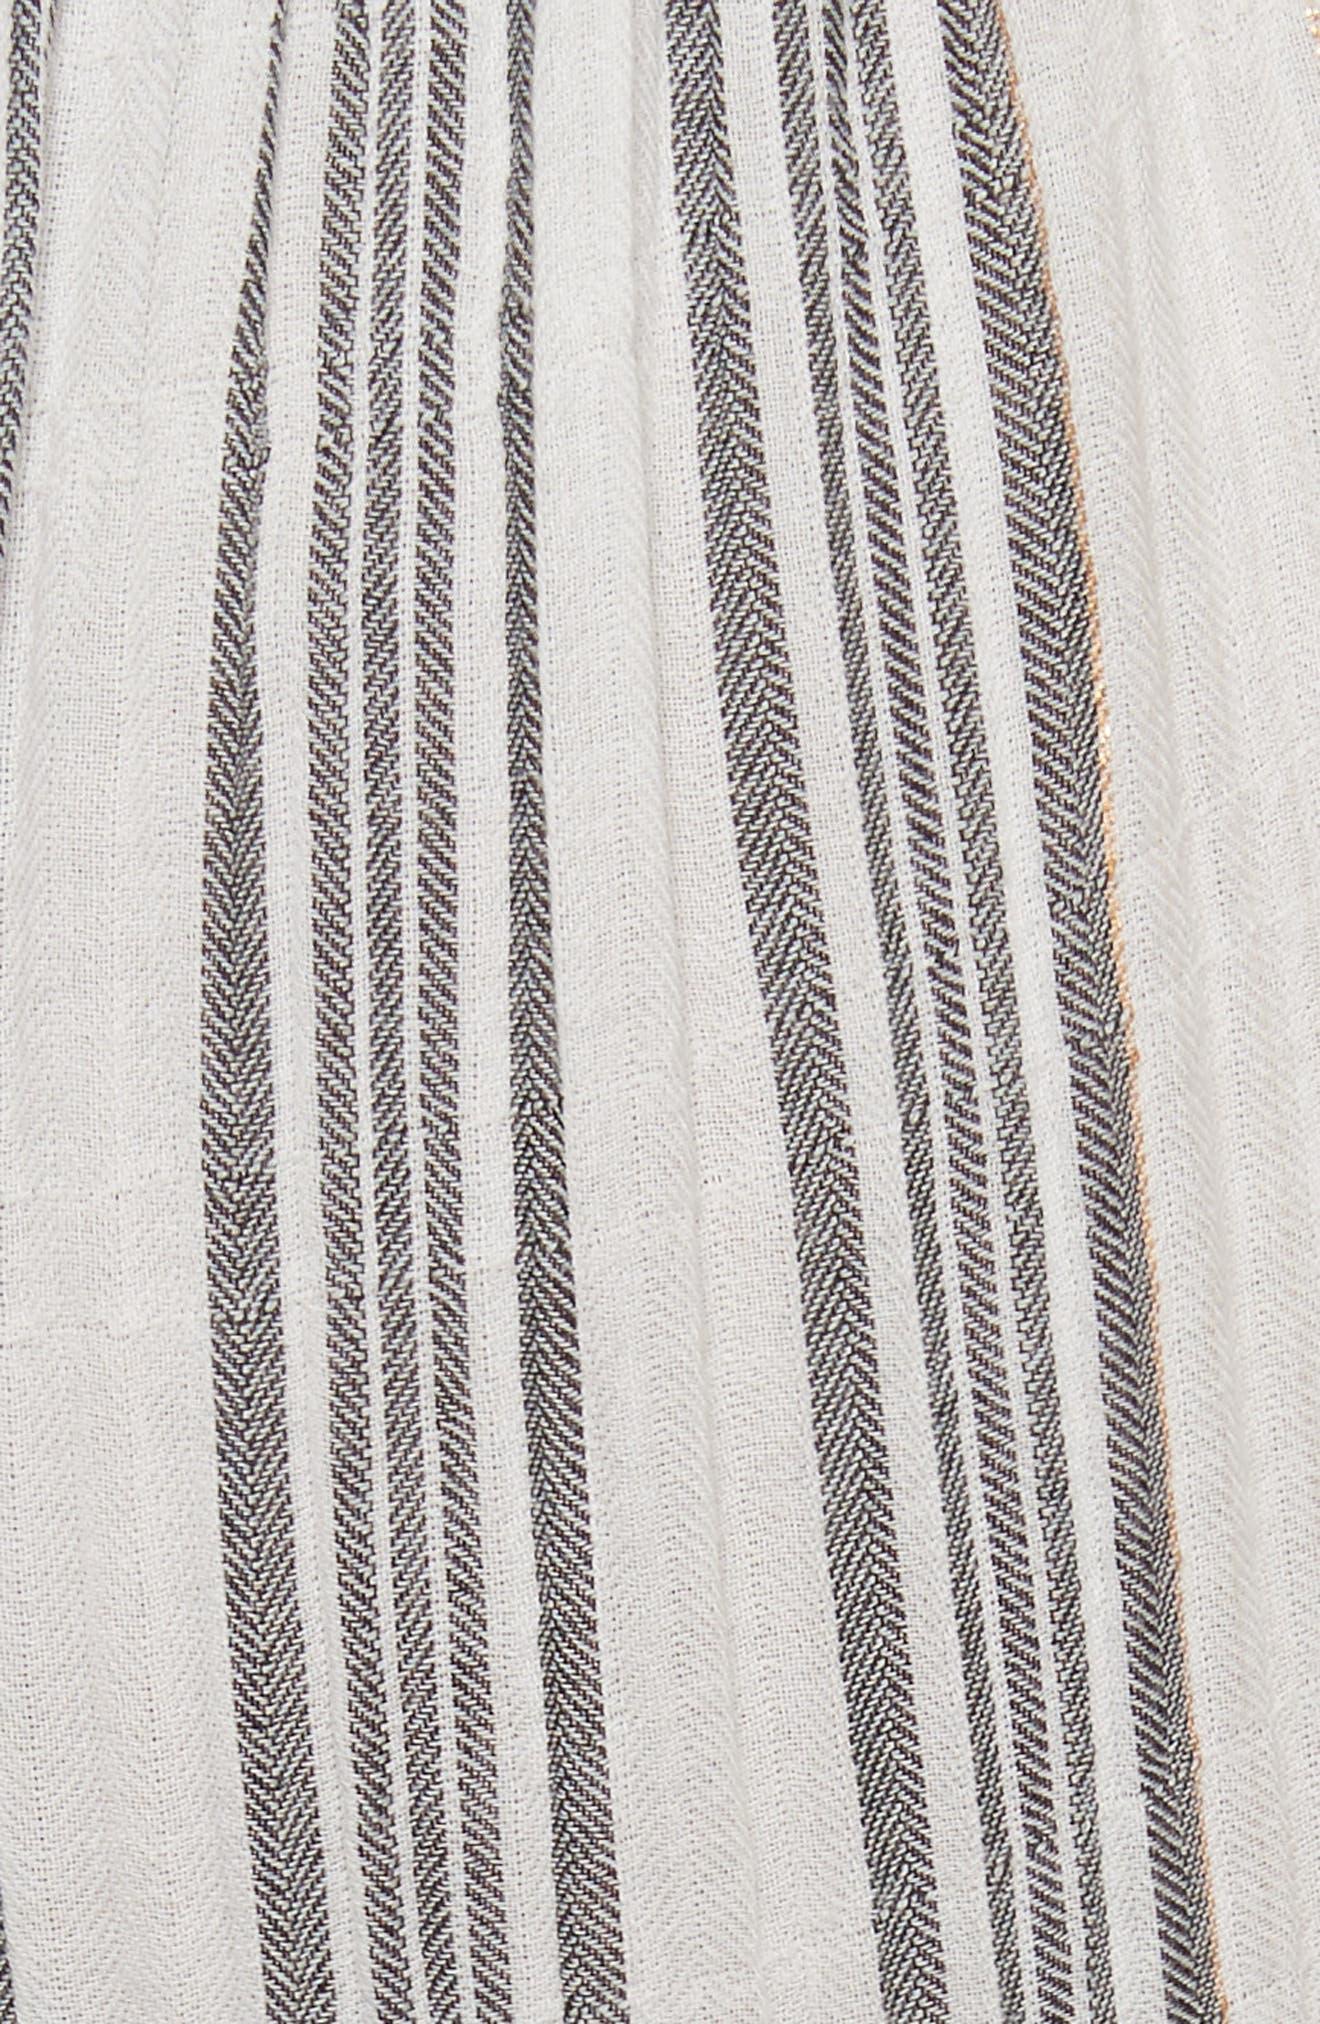 Sleeveless Gauzy Stripe Dress,                             Alternate thumbnail 5, color,                             Milk/ Washed Black Combo